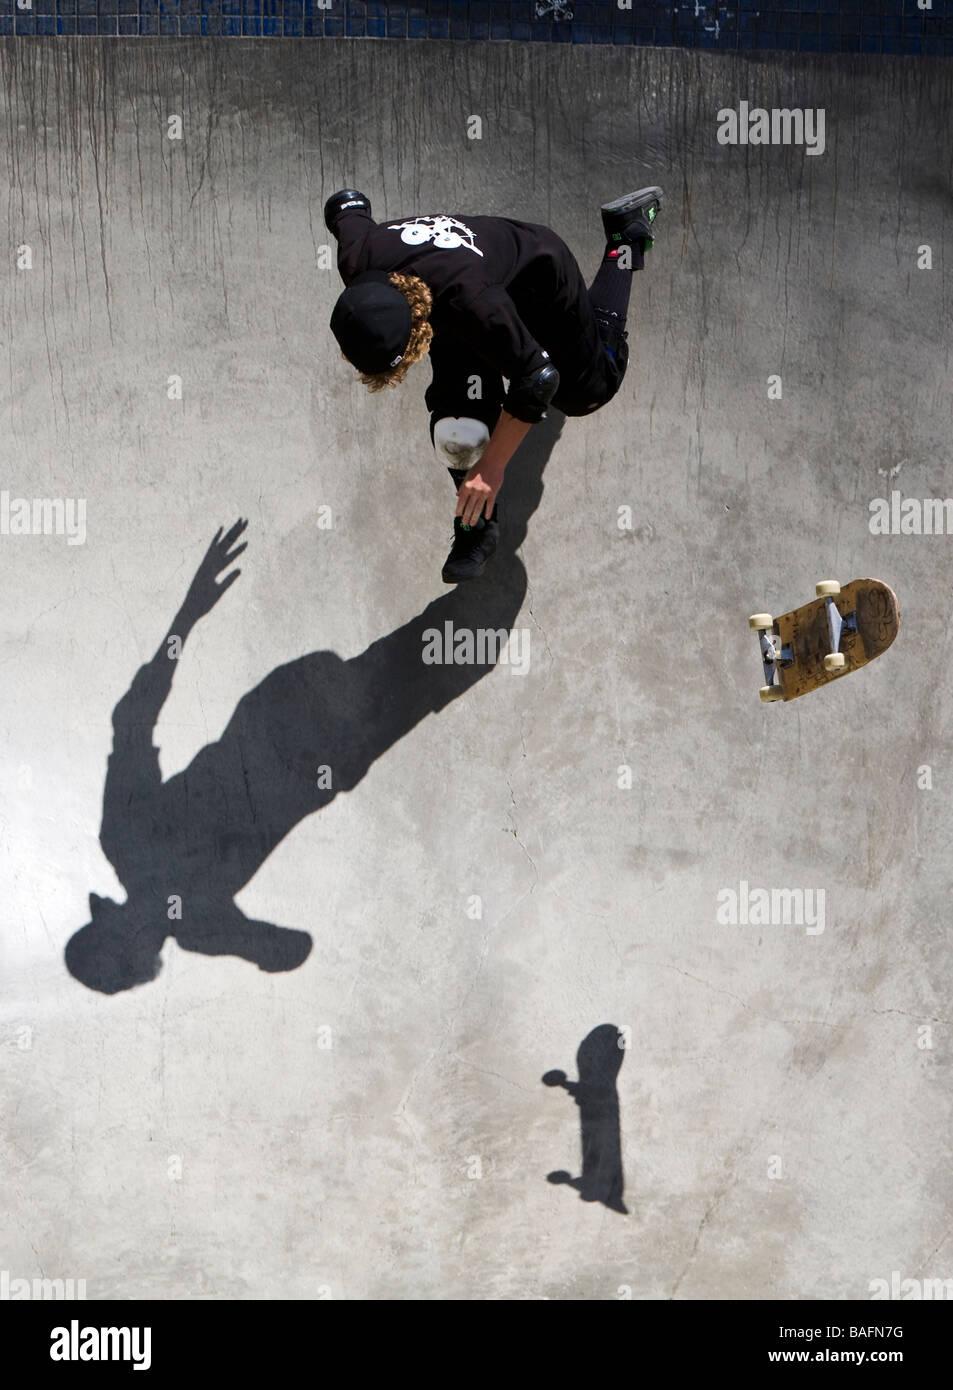 Skateboarder machen Tricks Culver City Skateboard Park Culver City Los Angeles County California Vereinigten Staaten Stockbild